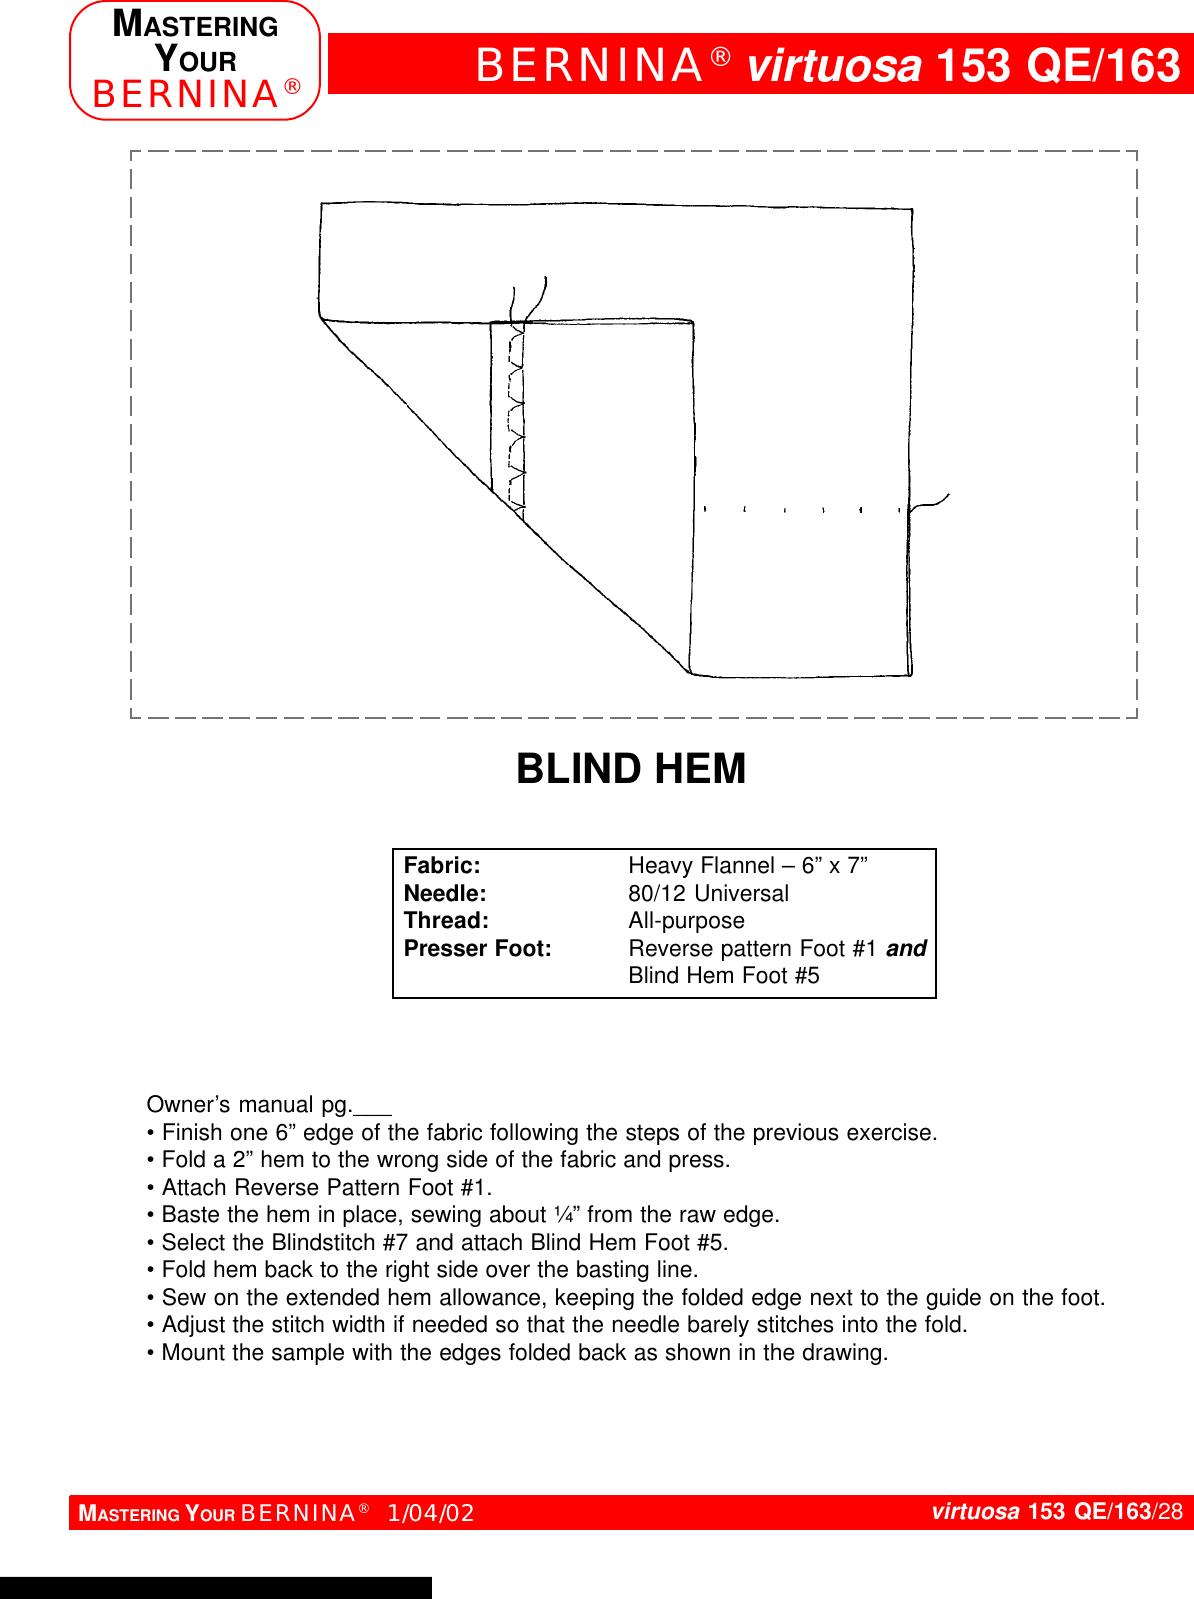 OVERLOCKER NYLON MONOFILAMENT INVISIBLE THREAD BLINDS SMOKE//CLEAR HEMMER